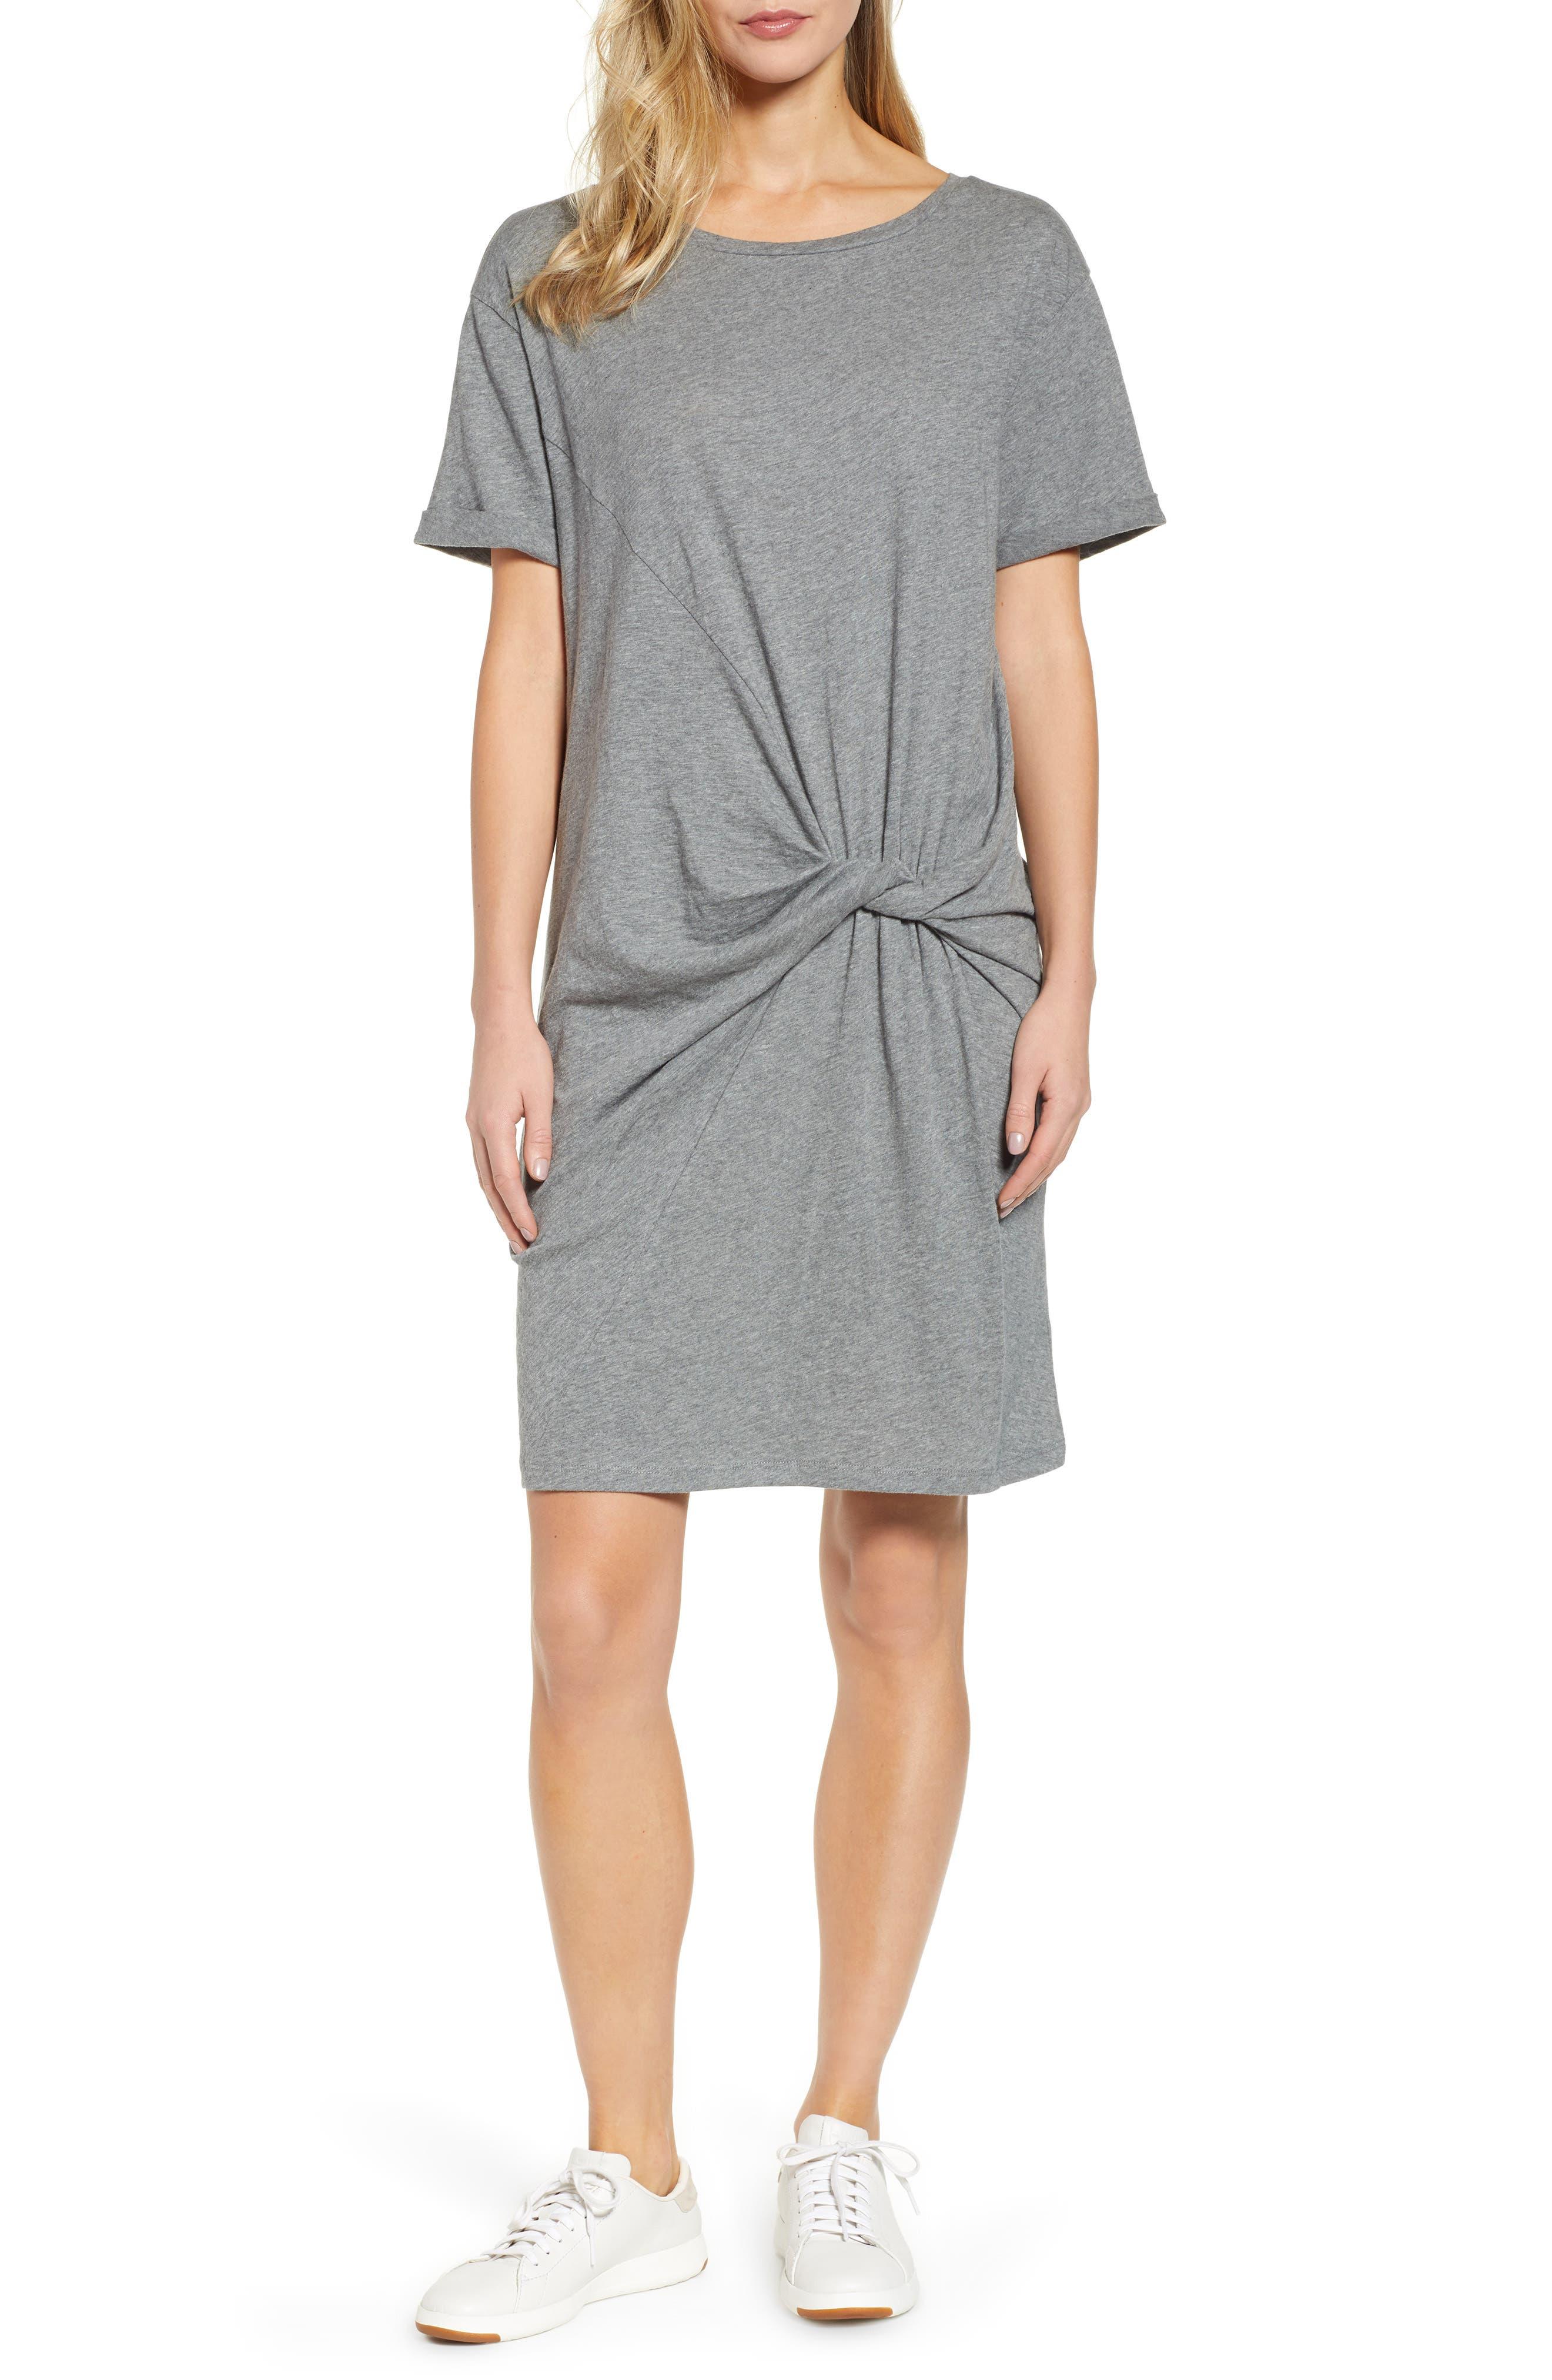 Knot Front T-Shirt Dress,                             Main thumbnail 1, color,                             GREY DARK HEATHER